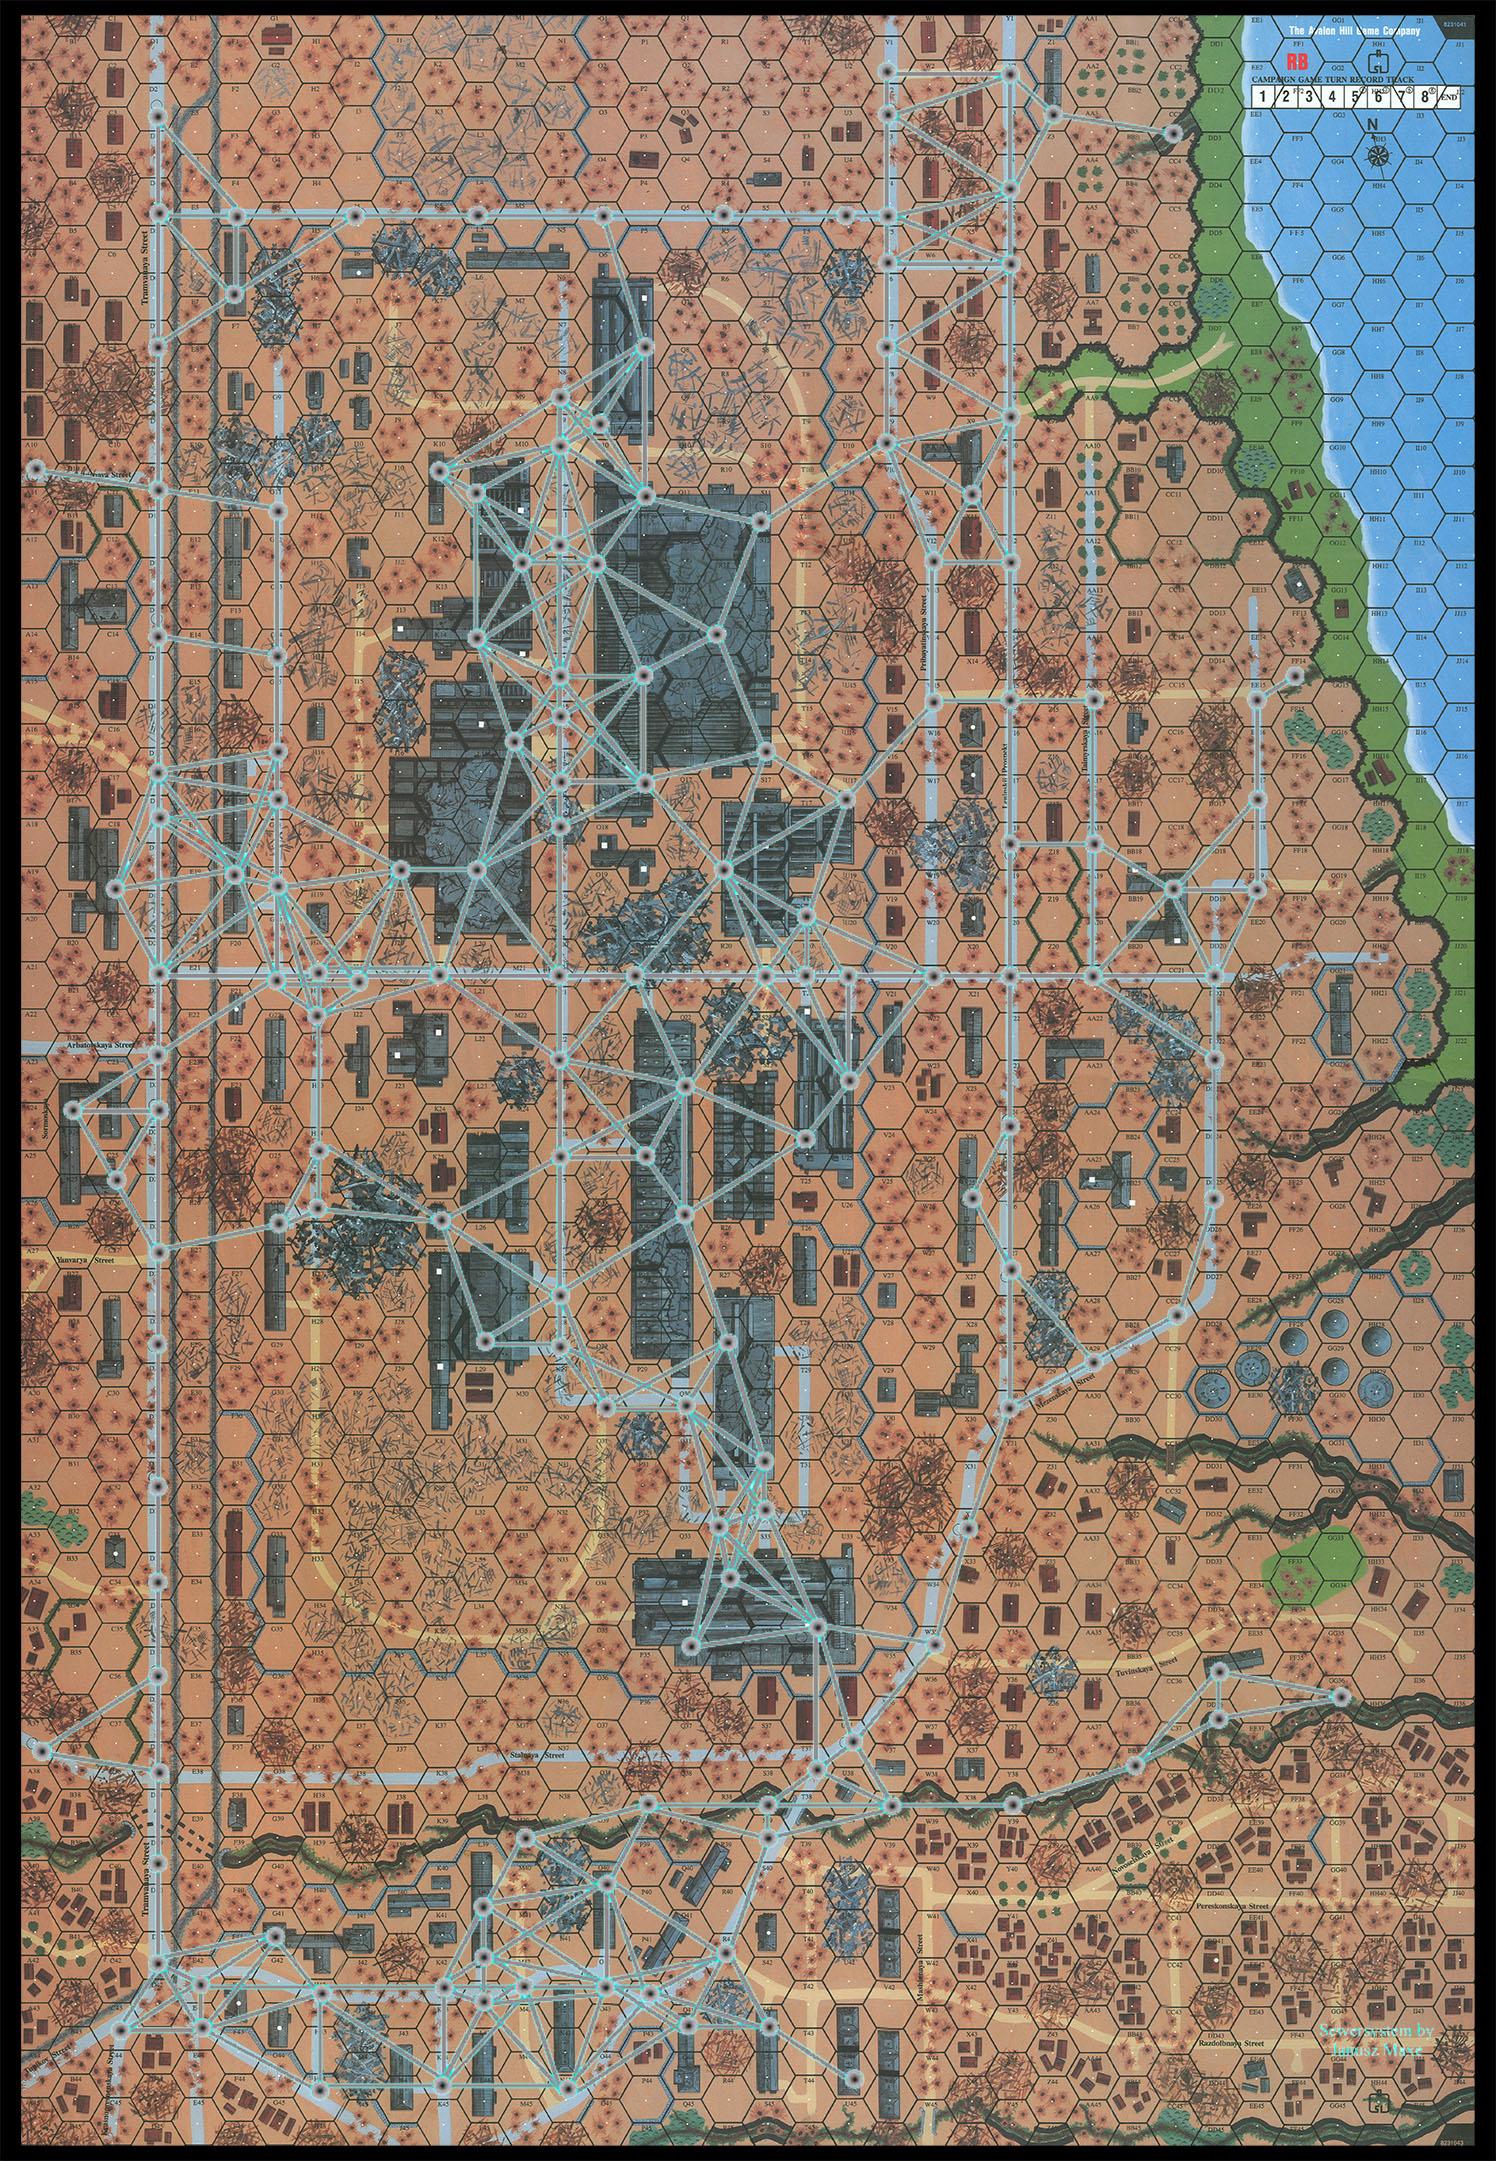 Red Barricades Sewer 200dpi.jpg